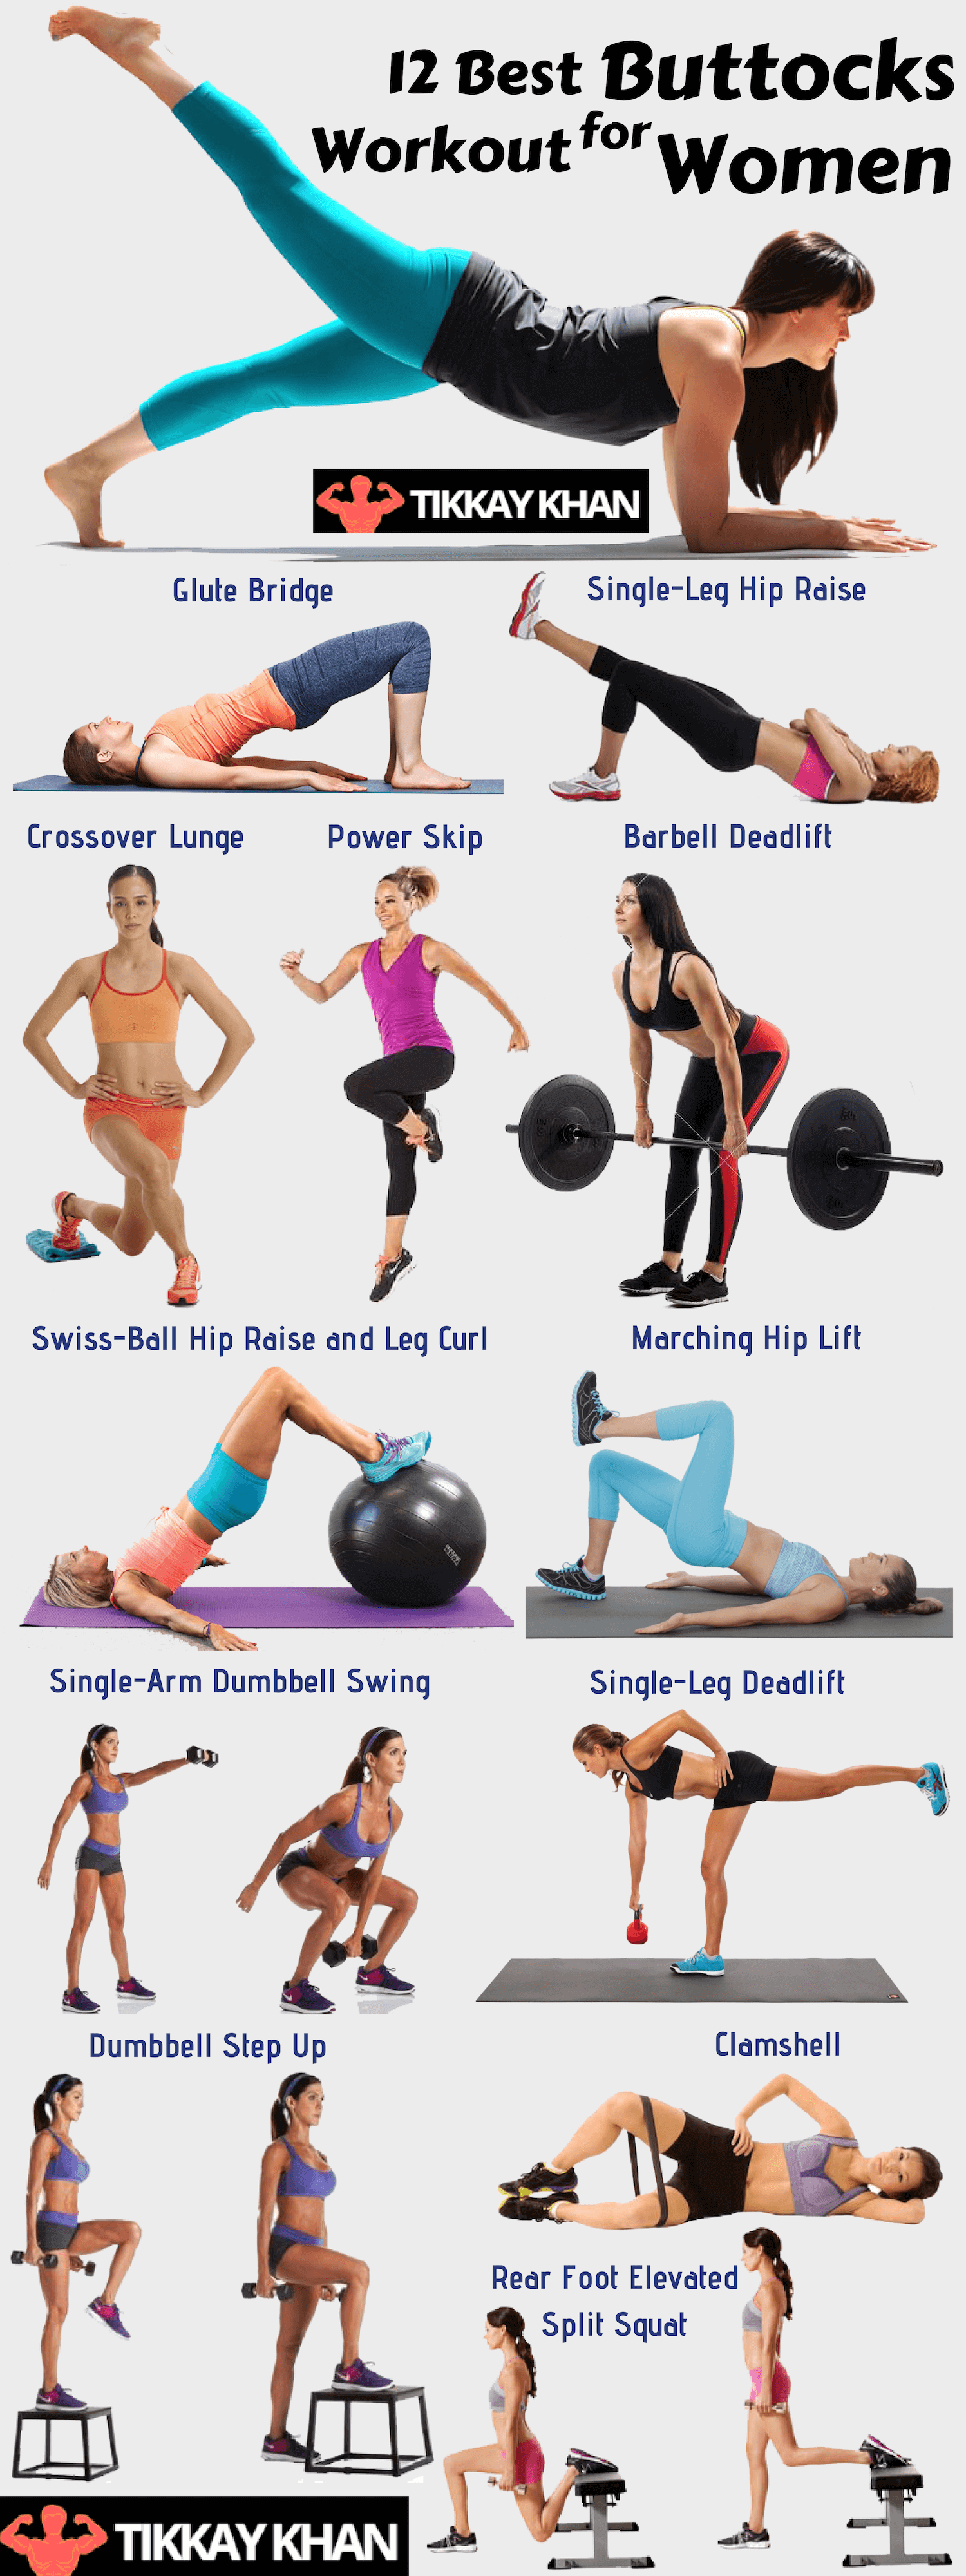 12 Best Buttocks Workout for Women Infographics